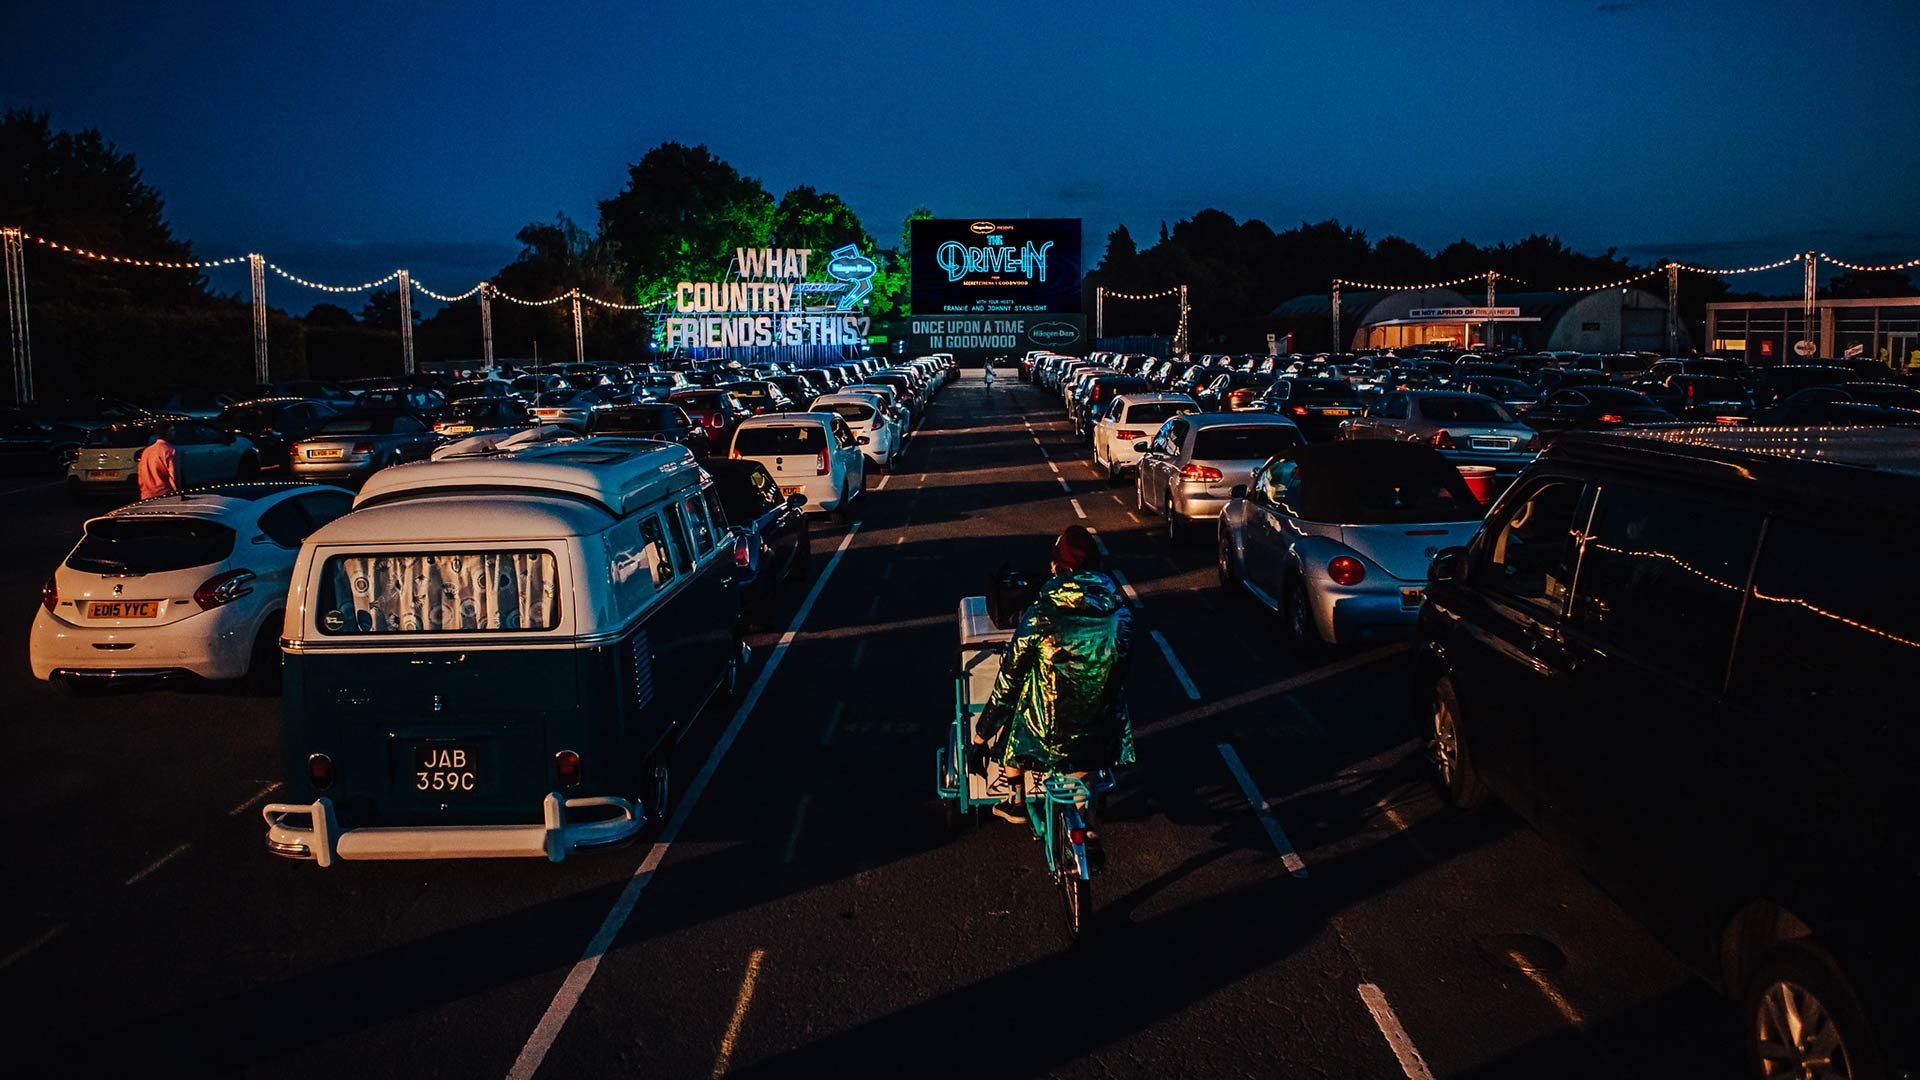 The Drive-In Big Screen Cinema